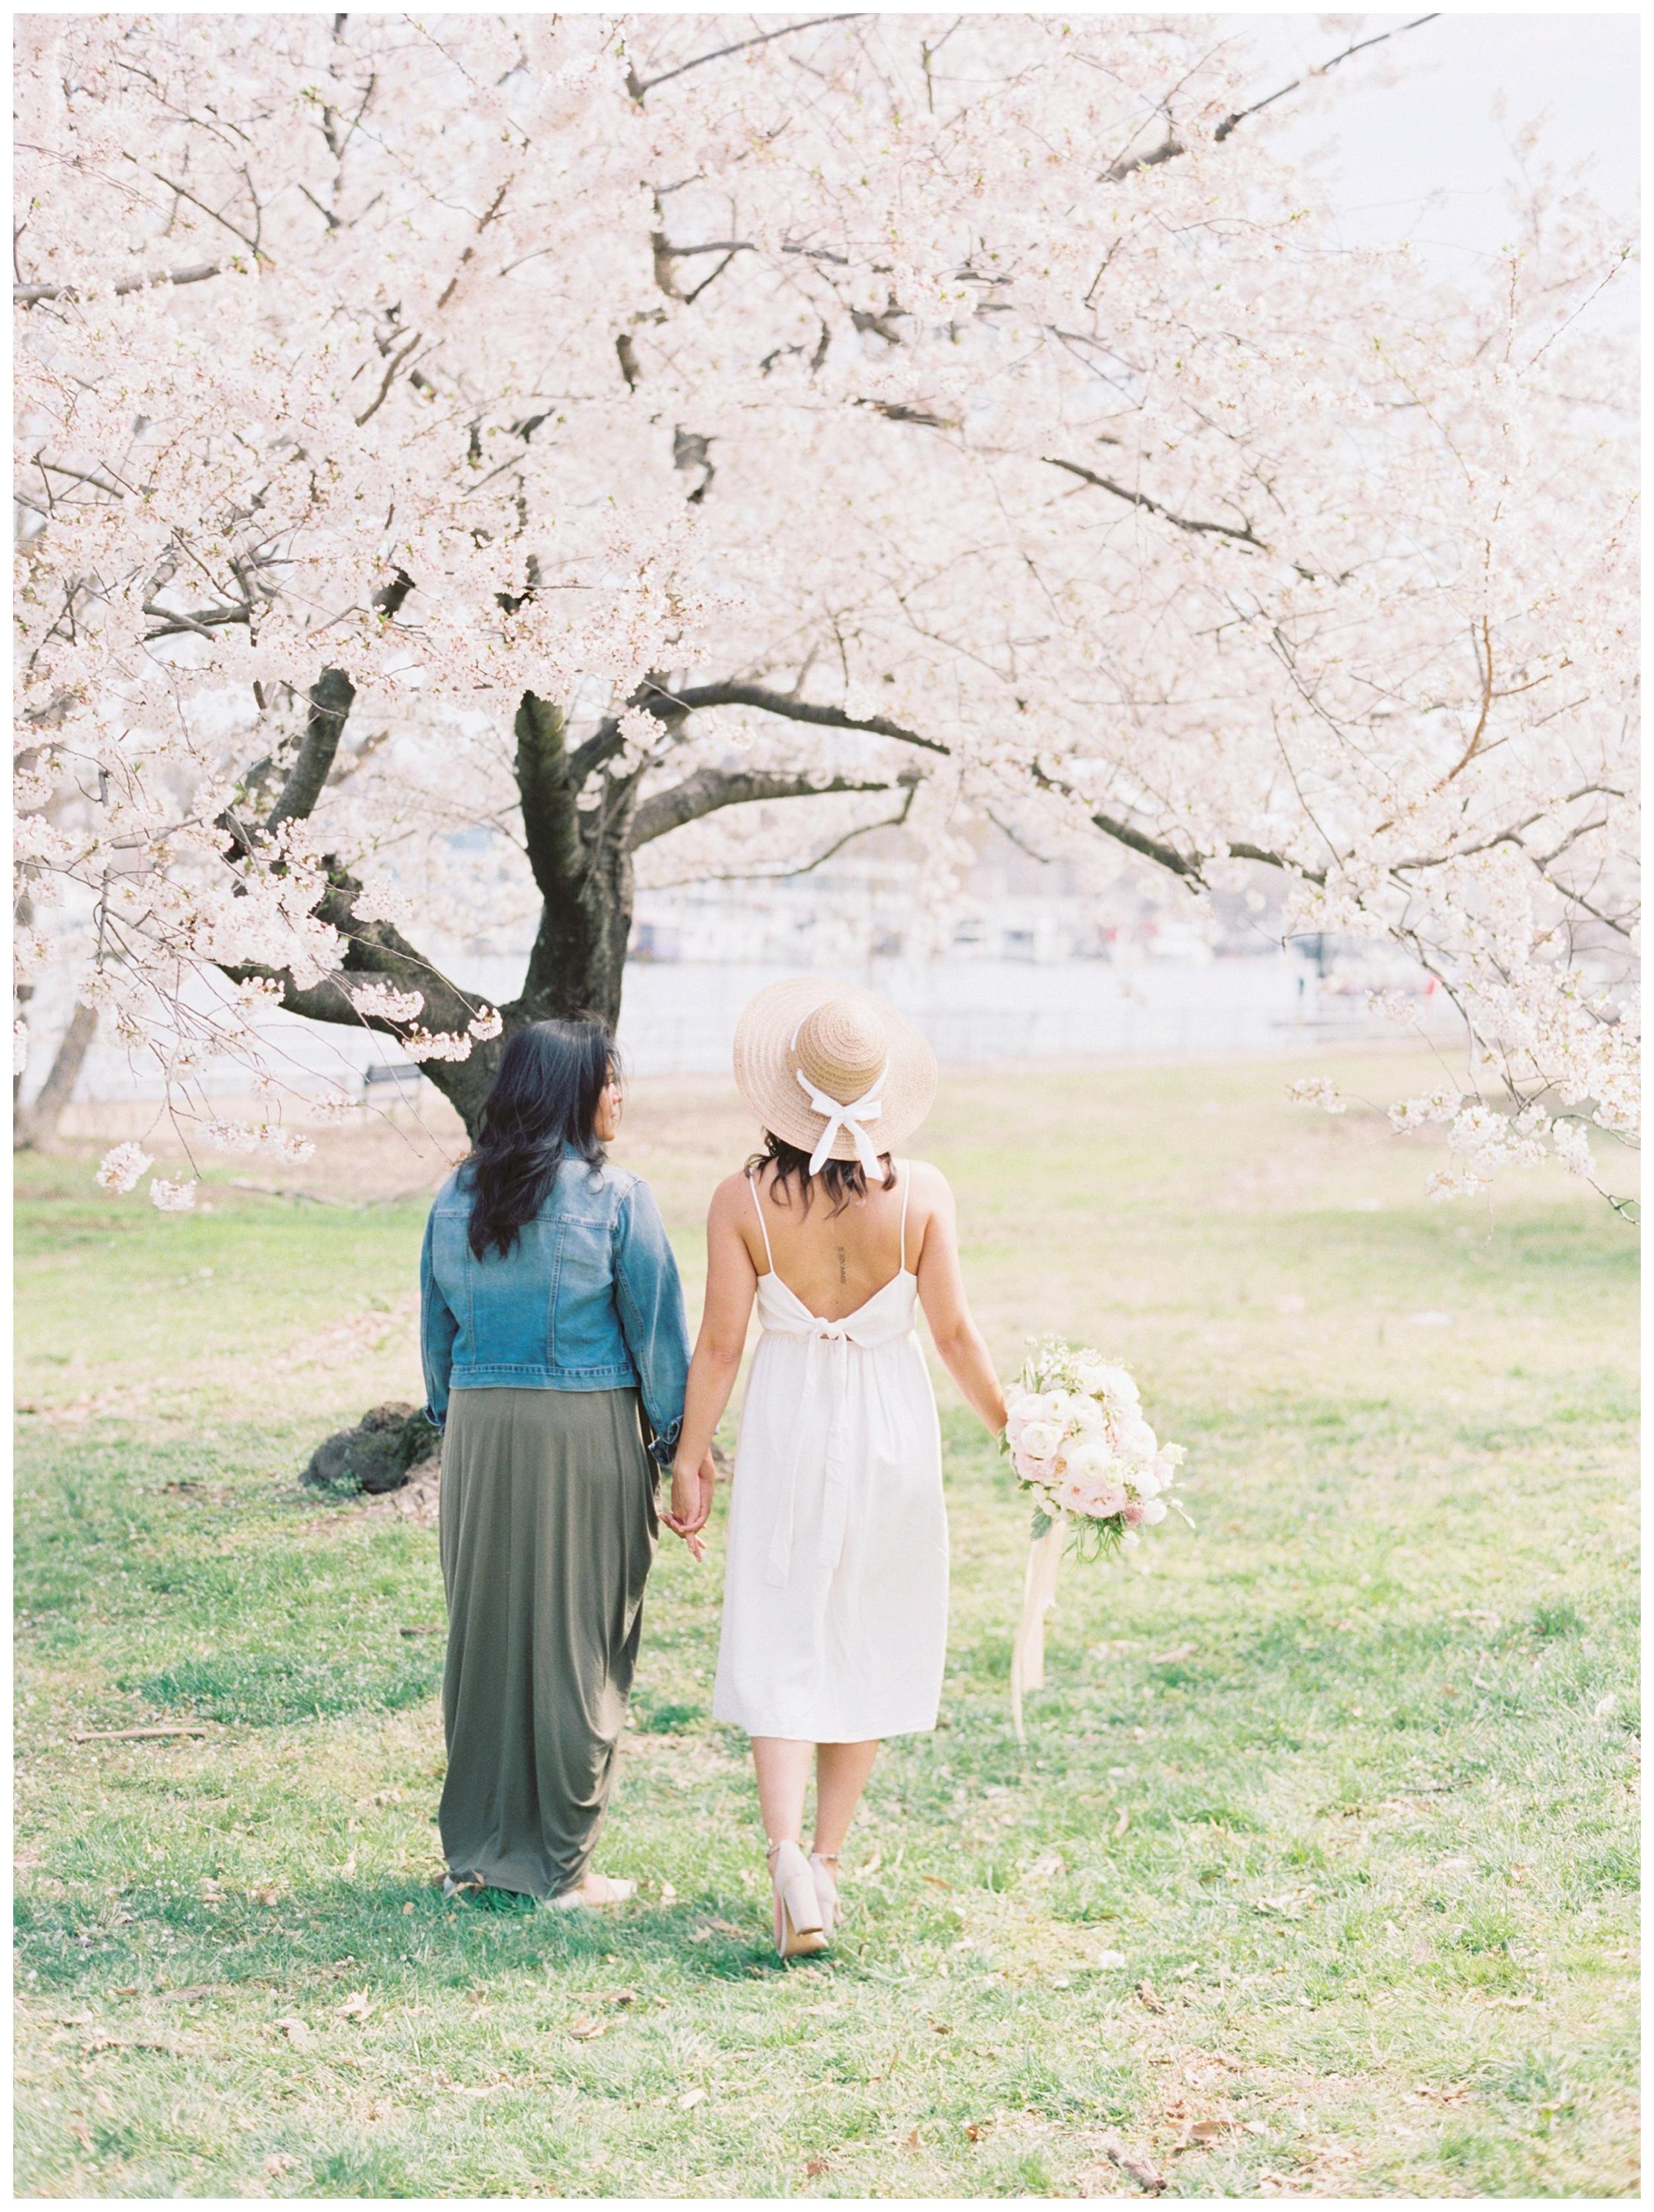 Same Sex DC Engagement | District of Columbia Cherry Blossom Engagement Kir Tuben_0014.jpg